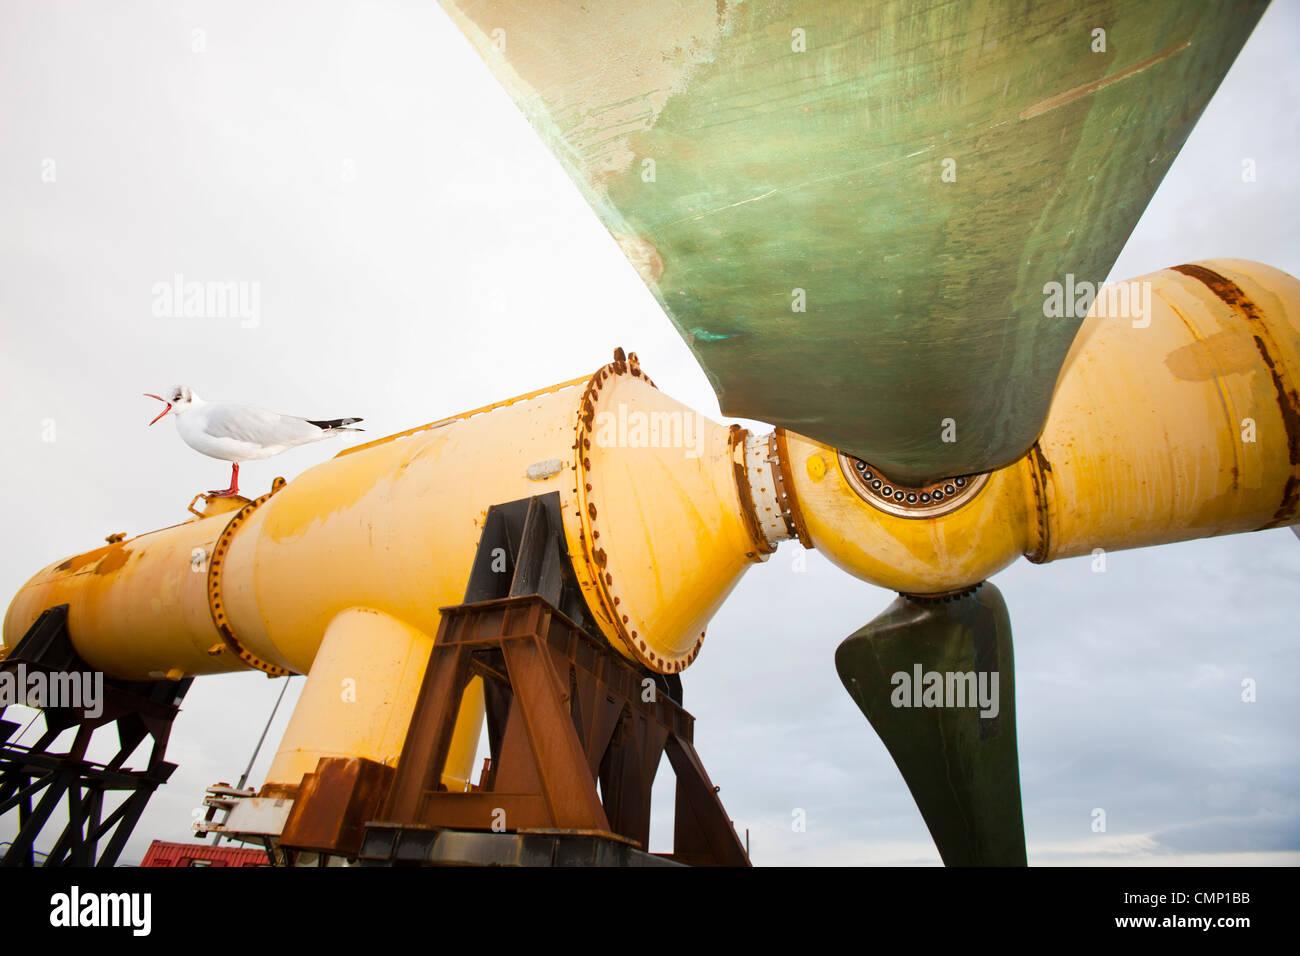 A tidal energy turbine on the dockside in Kirkwall, Orkney, Scotland, UK, - Stock Image